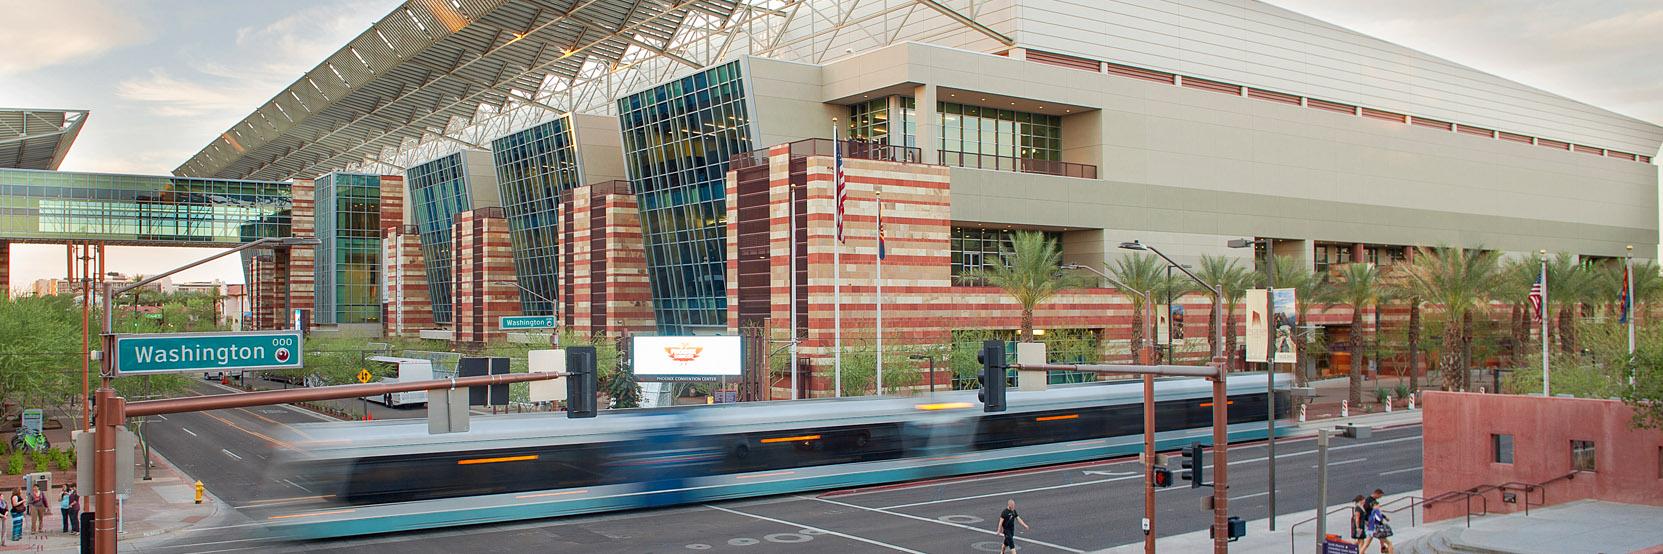 Phoenix Convention Center Meeting Facilities Visitphoenix